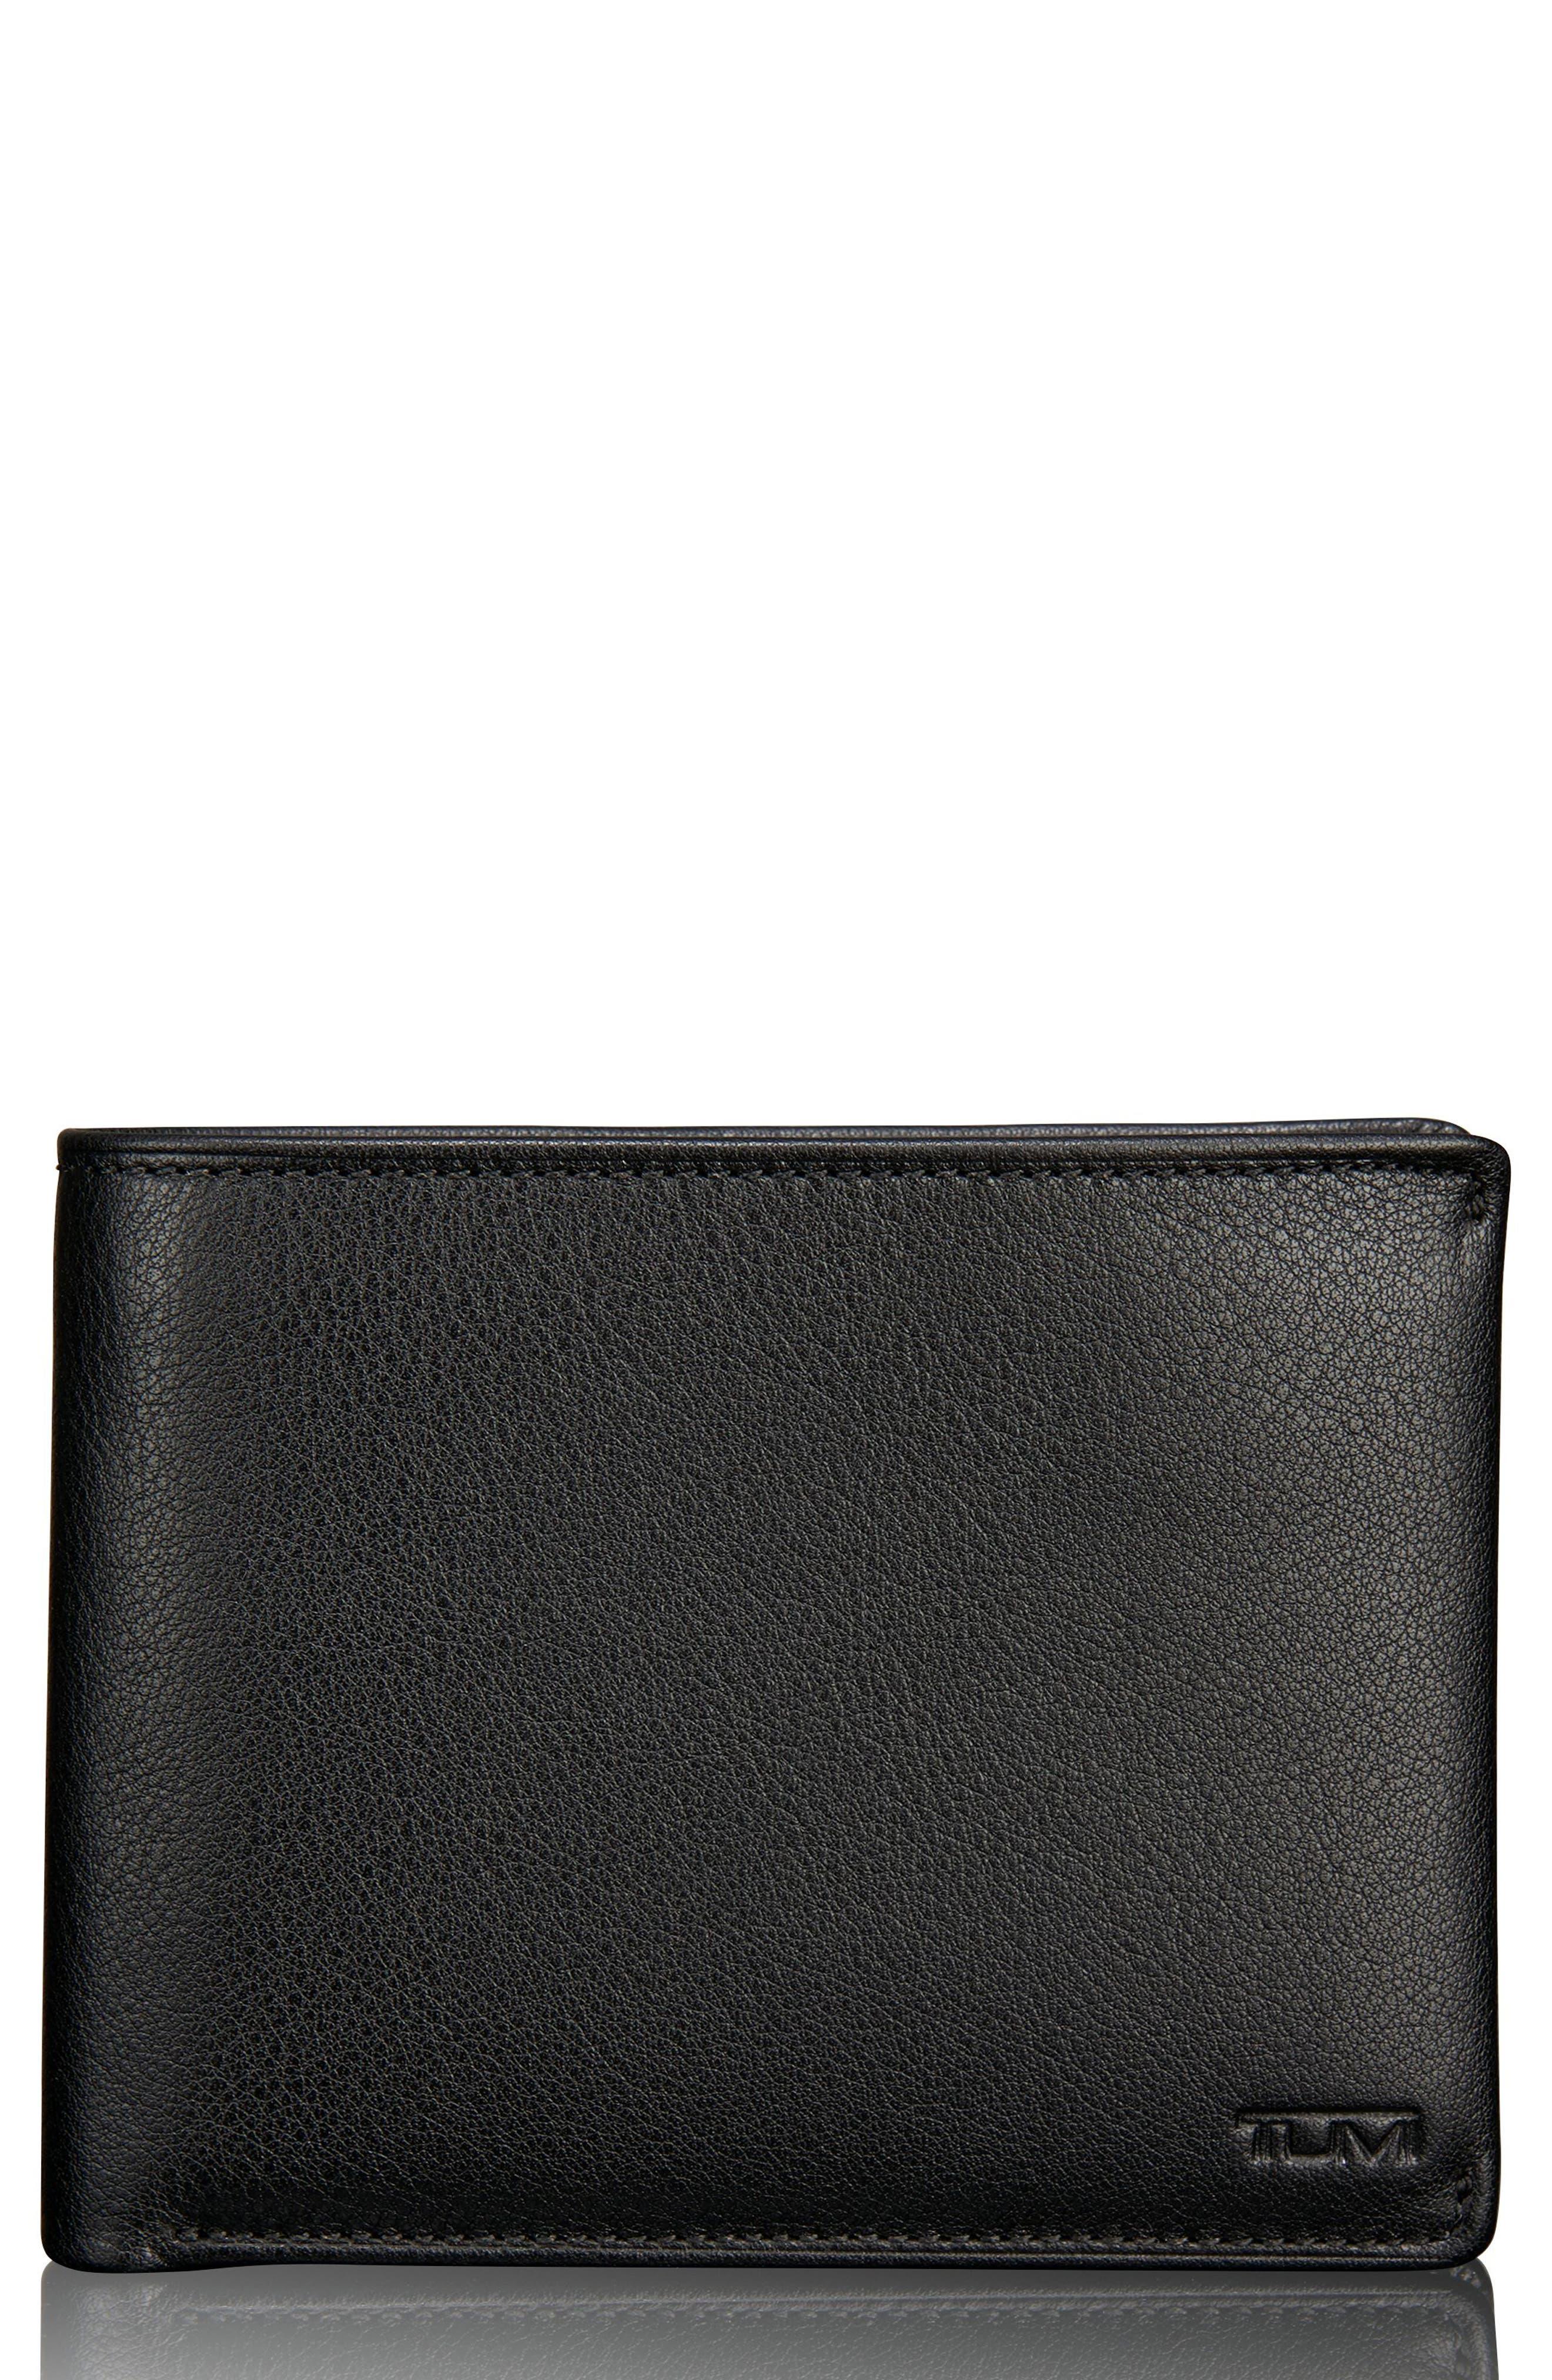 Global Passcase Wallet,                             Main thumbnail 1, color,                             011